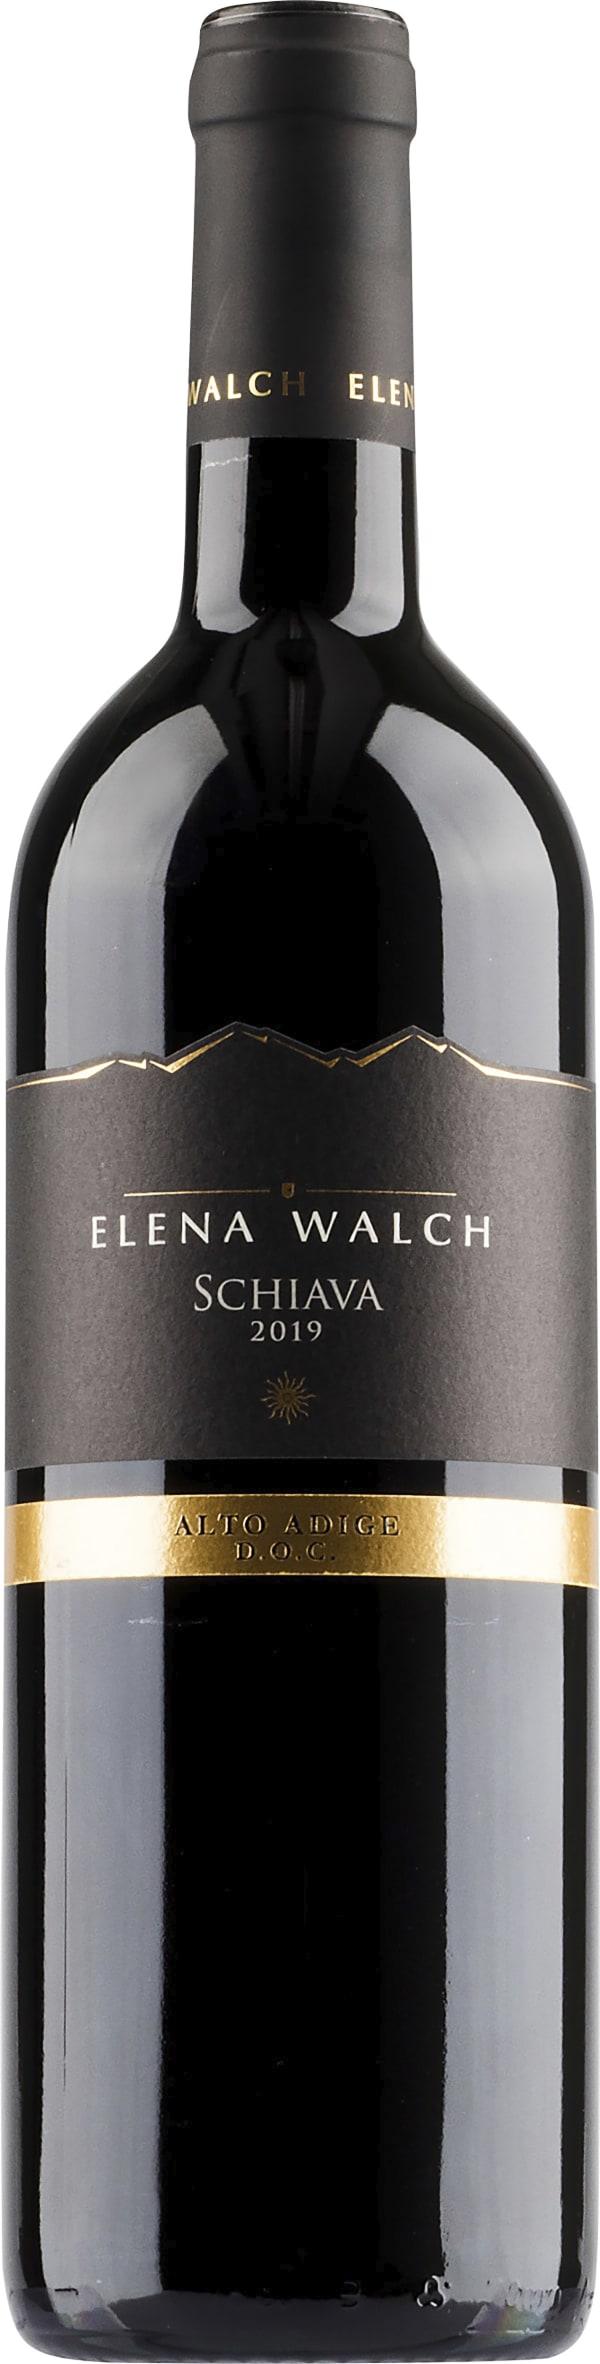 Elena Walch Schiava 2019